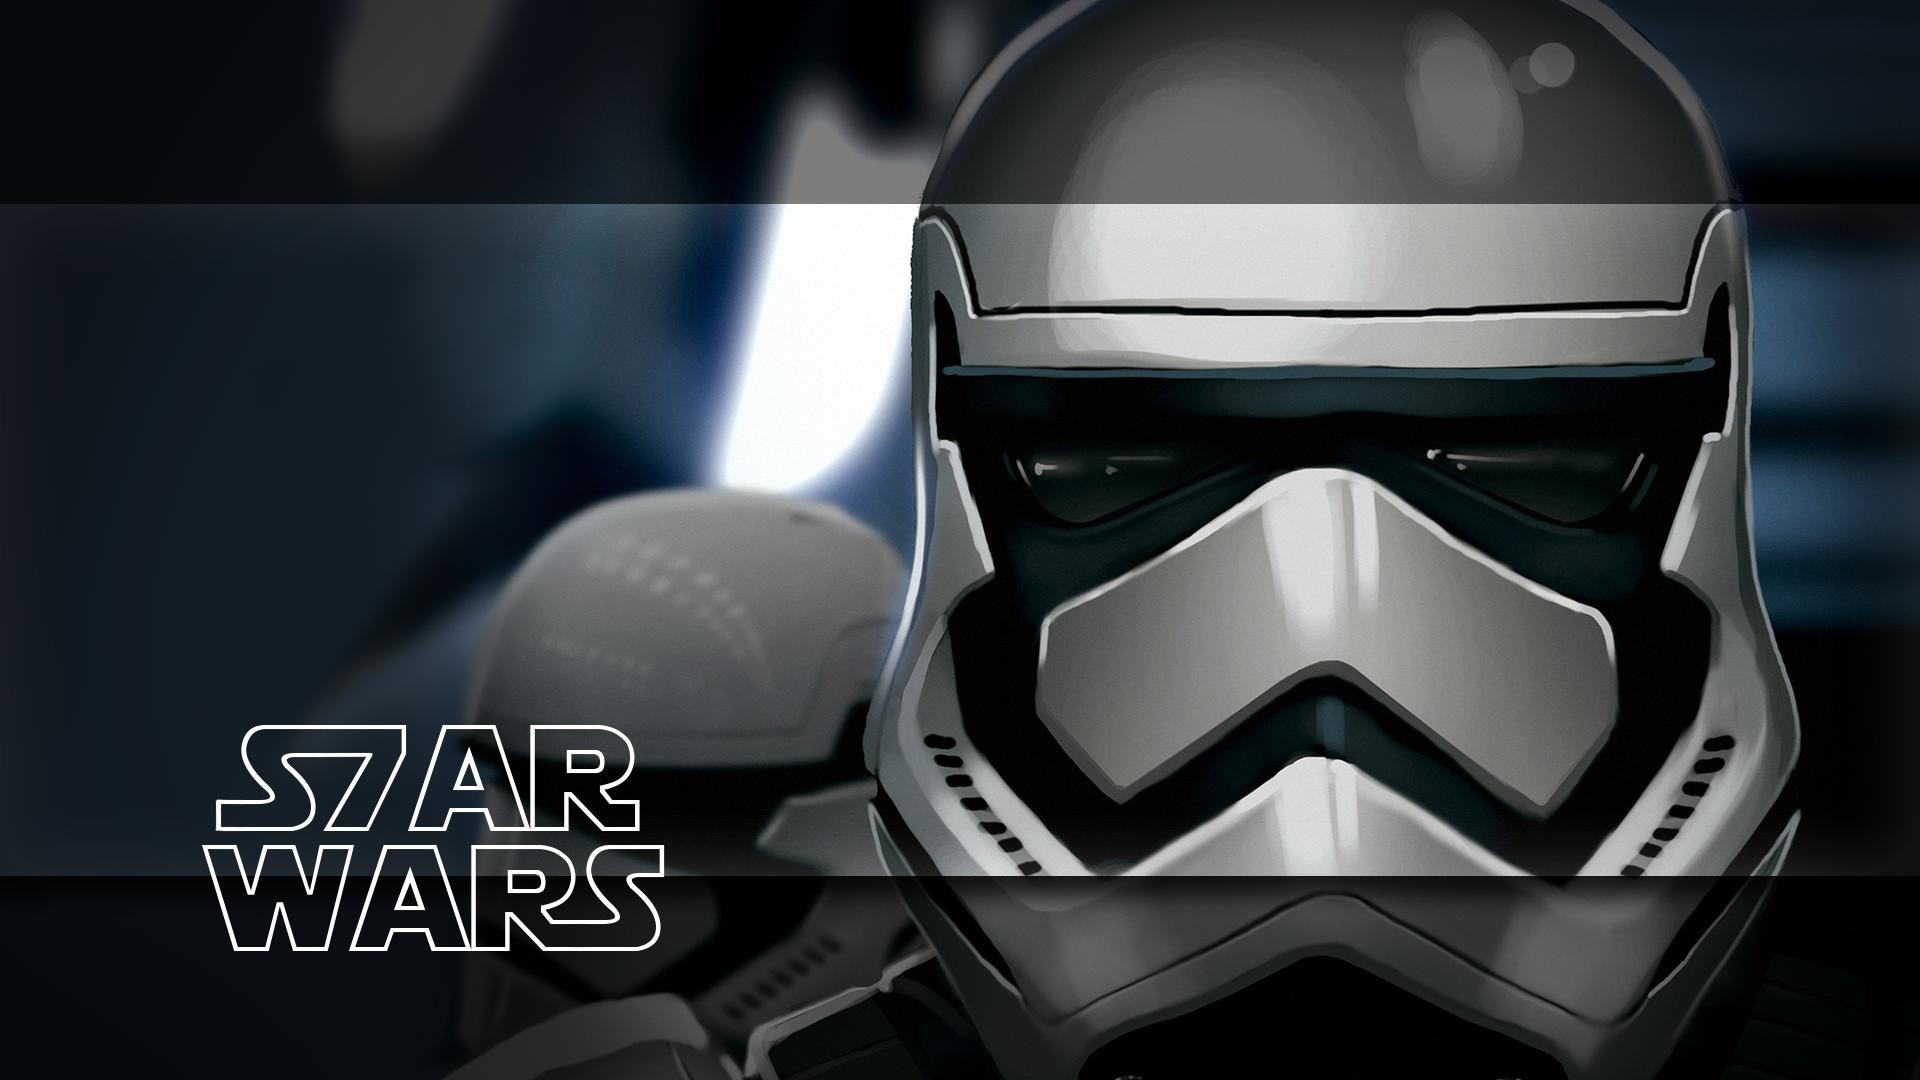 BW495: Stormtrooper Wallpapers, Stormtrooper Pictures in Best .